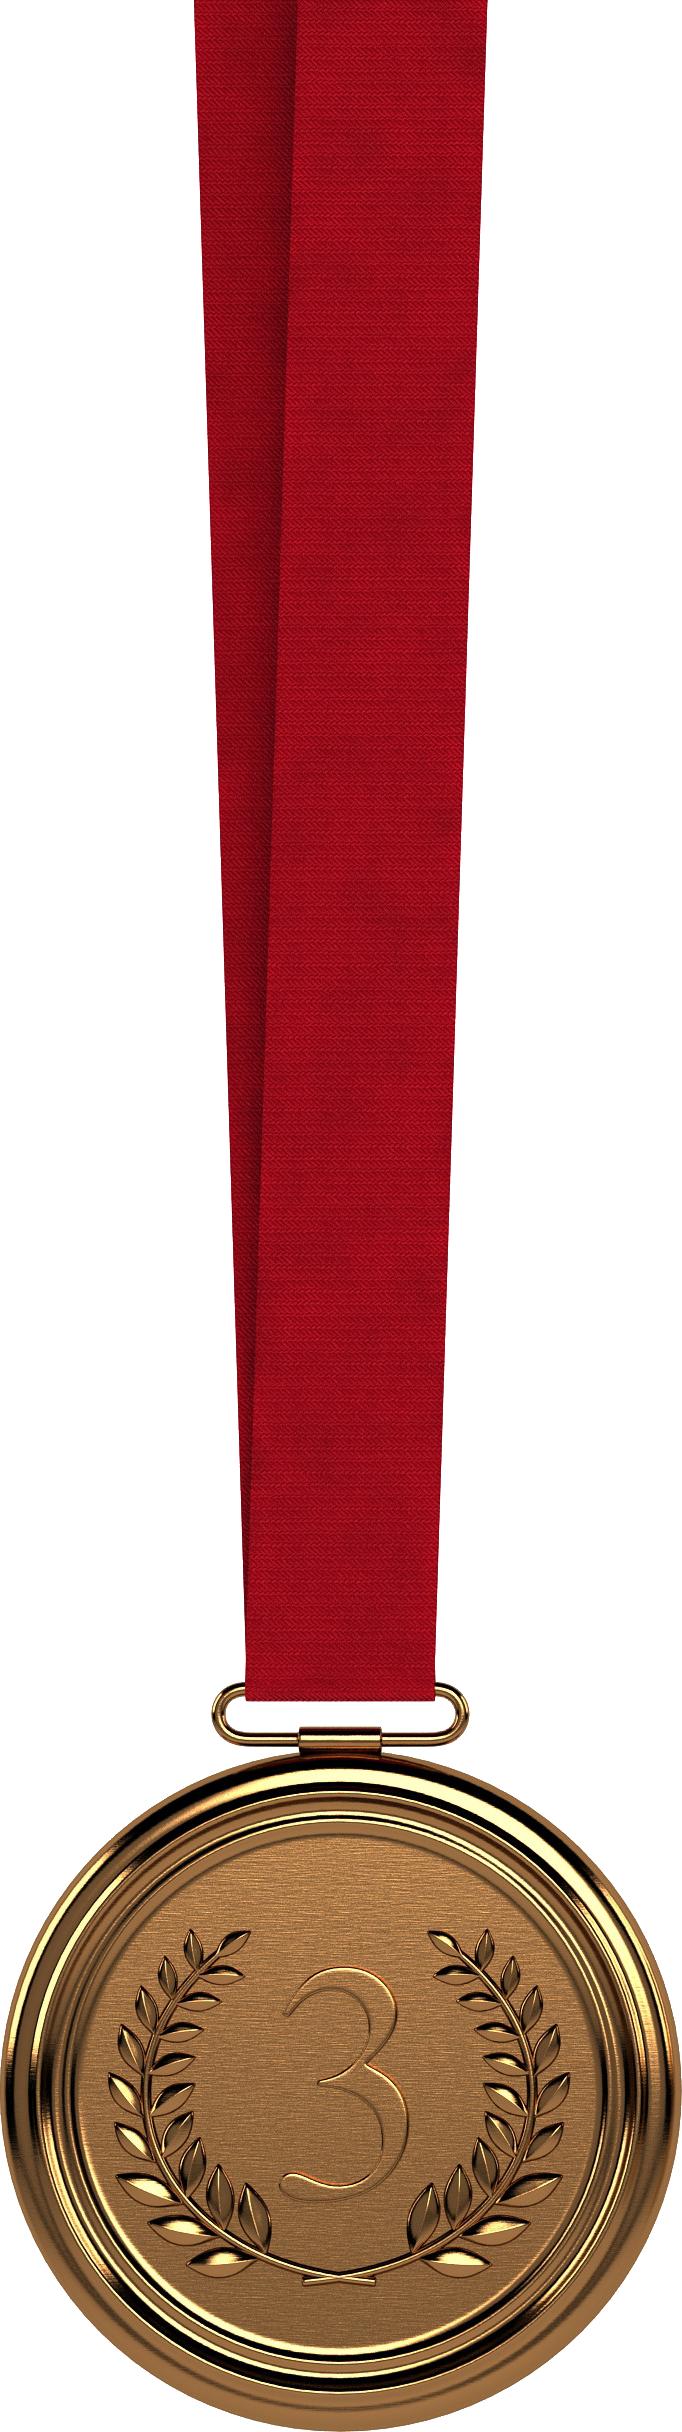 Бронзовая медаль PNG